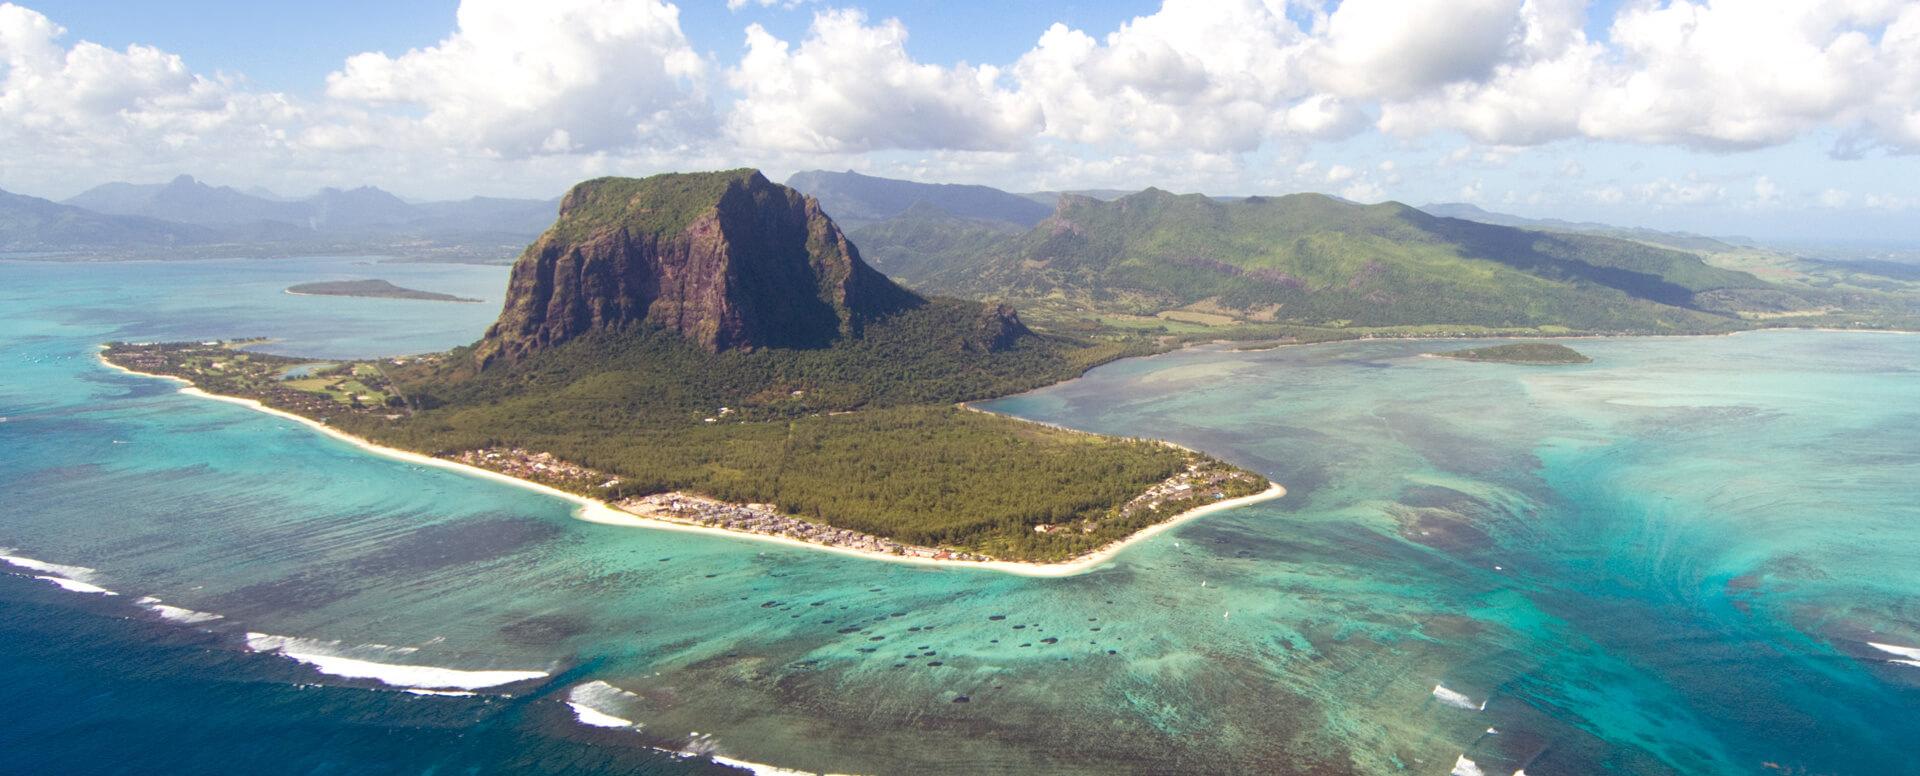 La côte Ouest - Ile Maurice